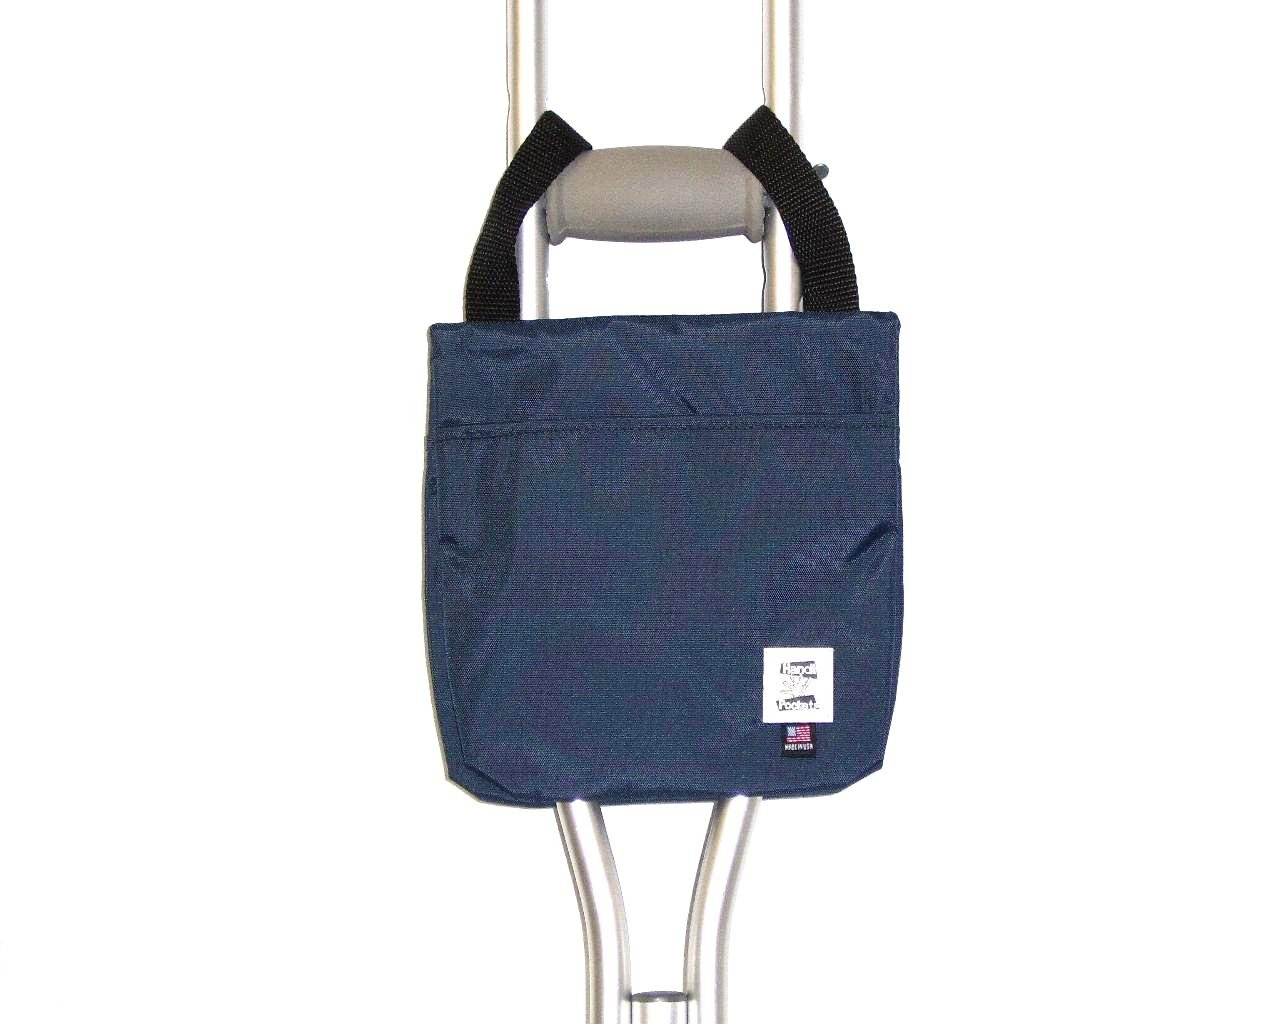 Handi Pockets 1a4nb Storage Accessory Crutch, Nylon, Navy Blue